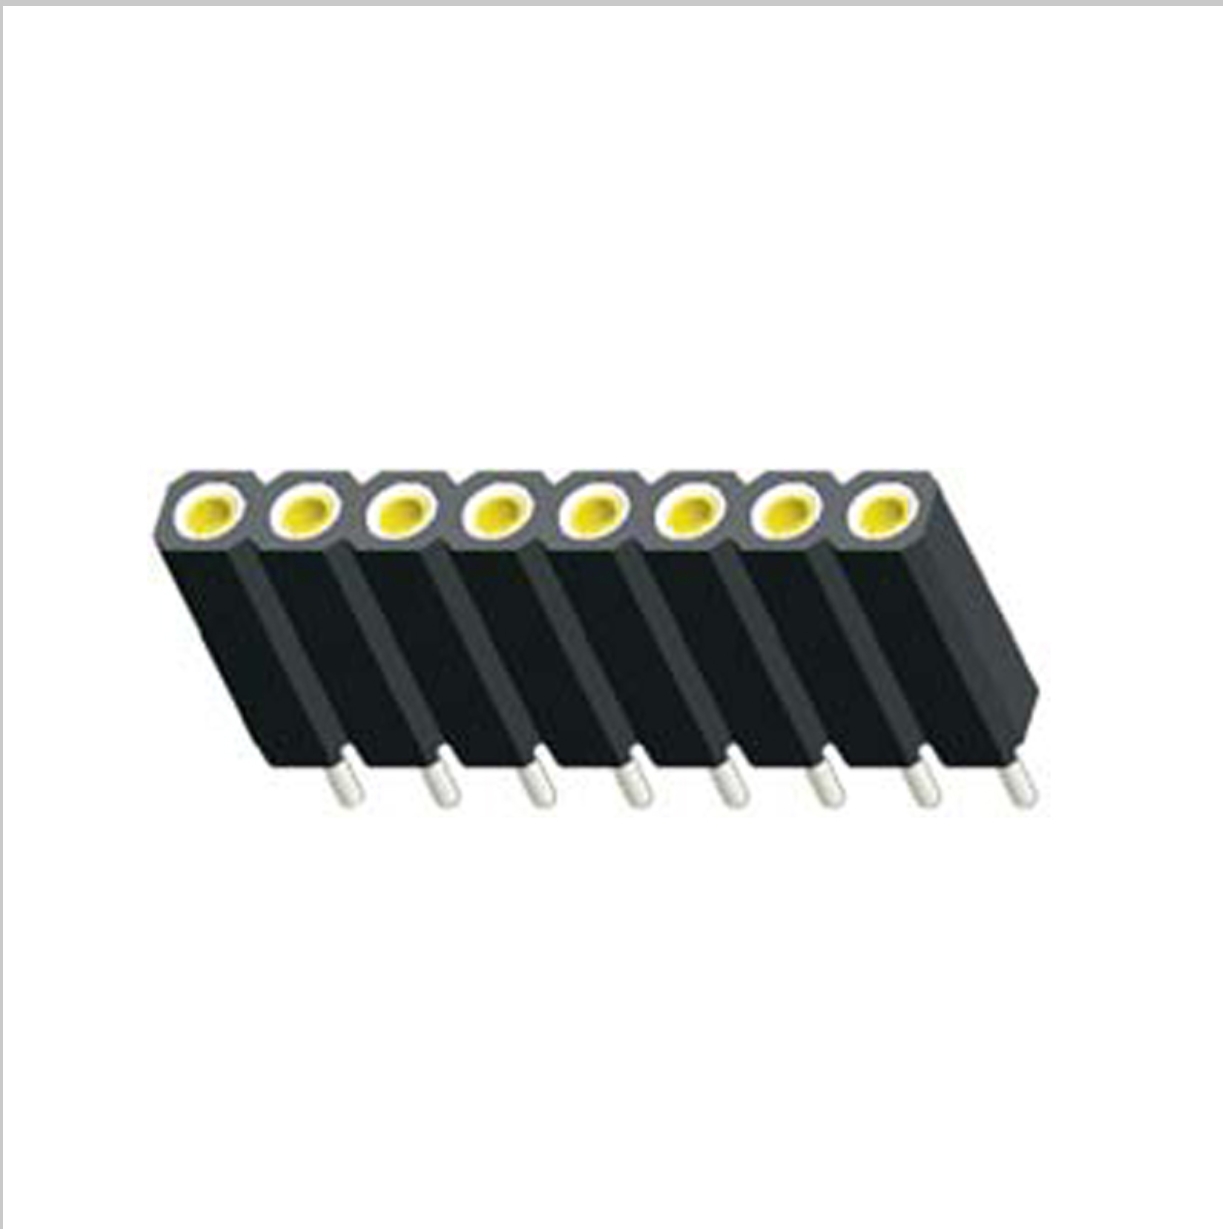 L488XX-97XXX 排母圆孔型PH2.54X3.0 单排 卧贴